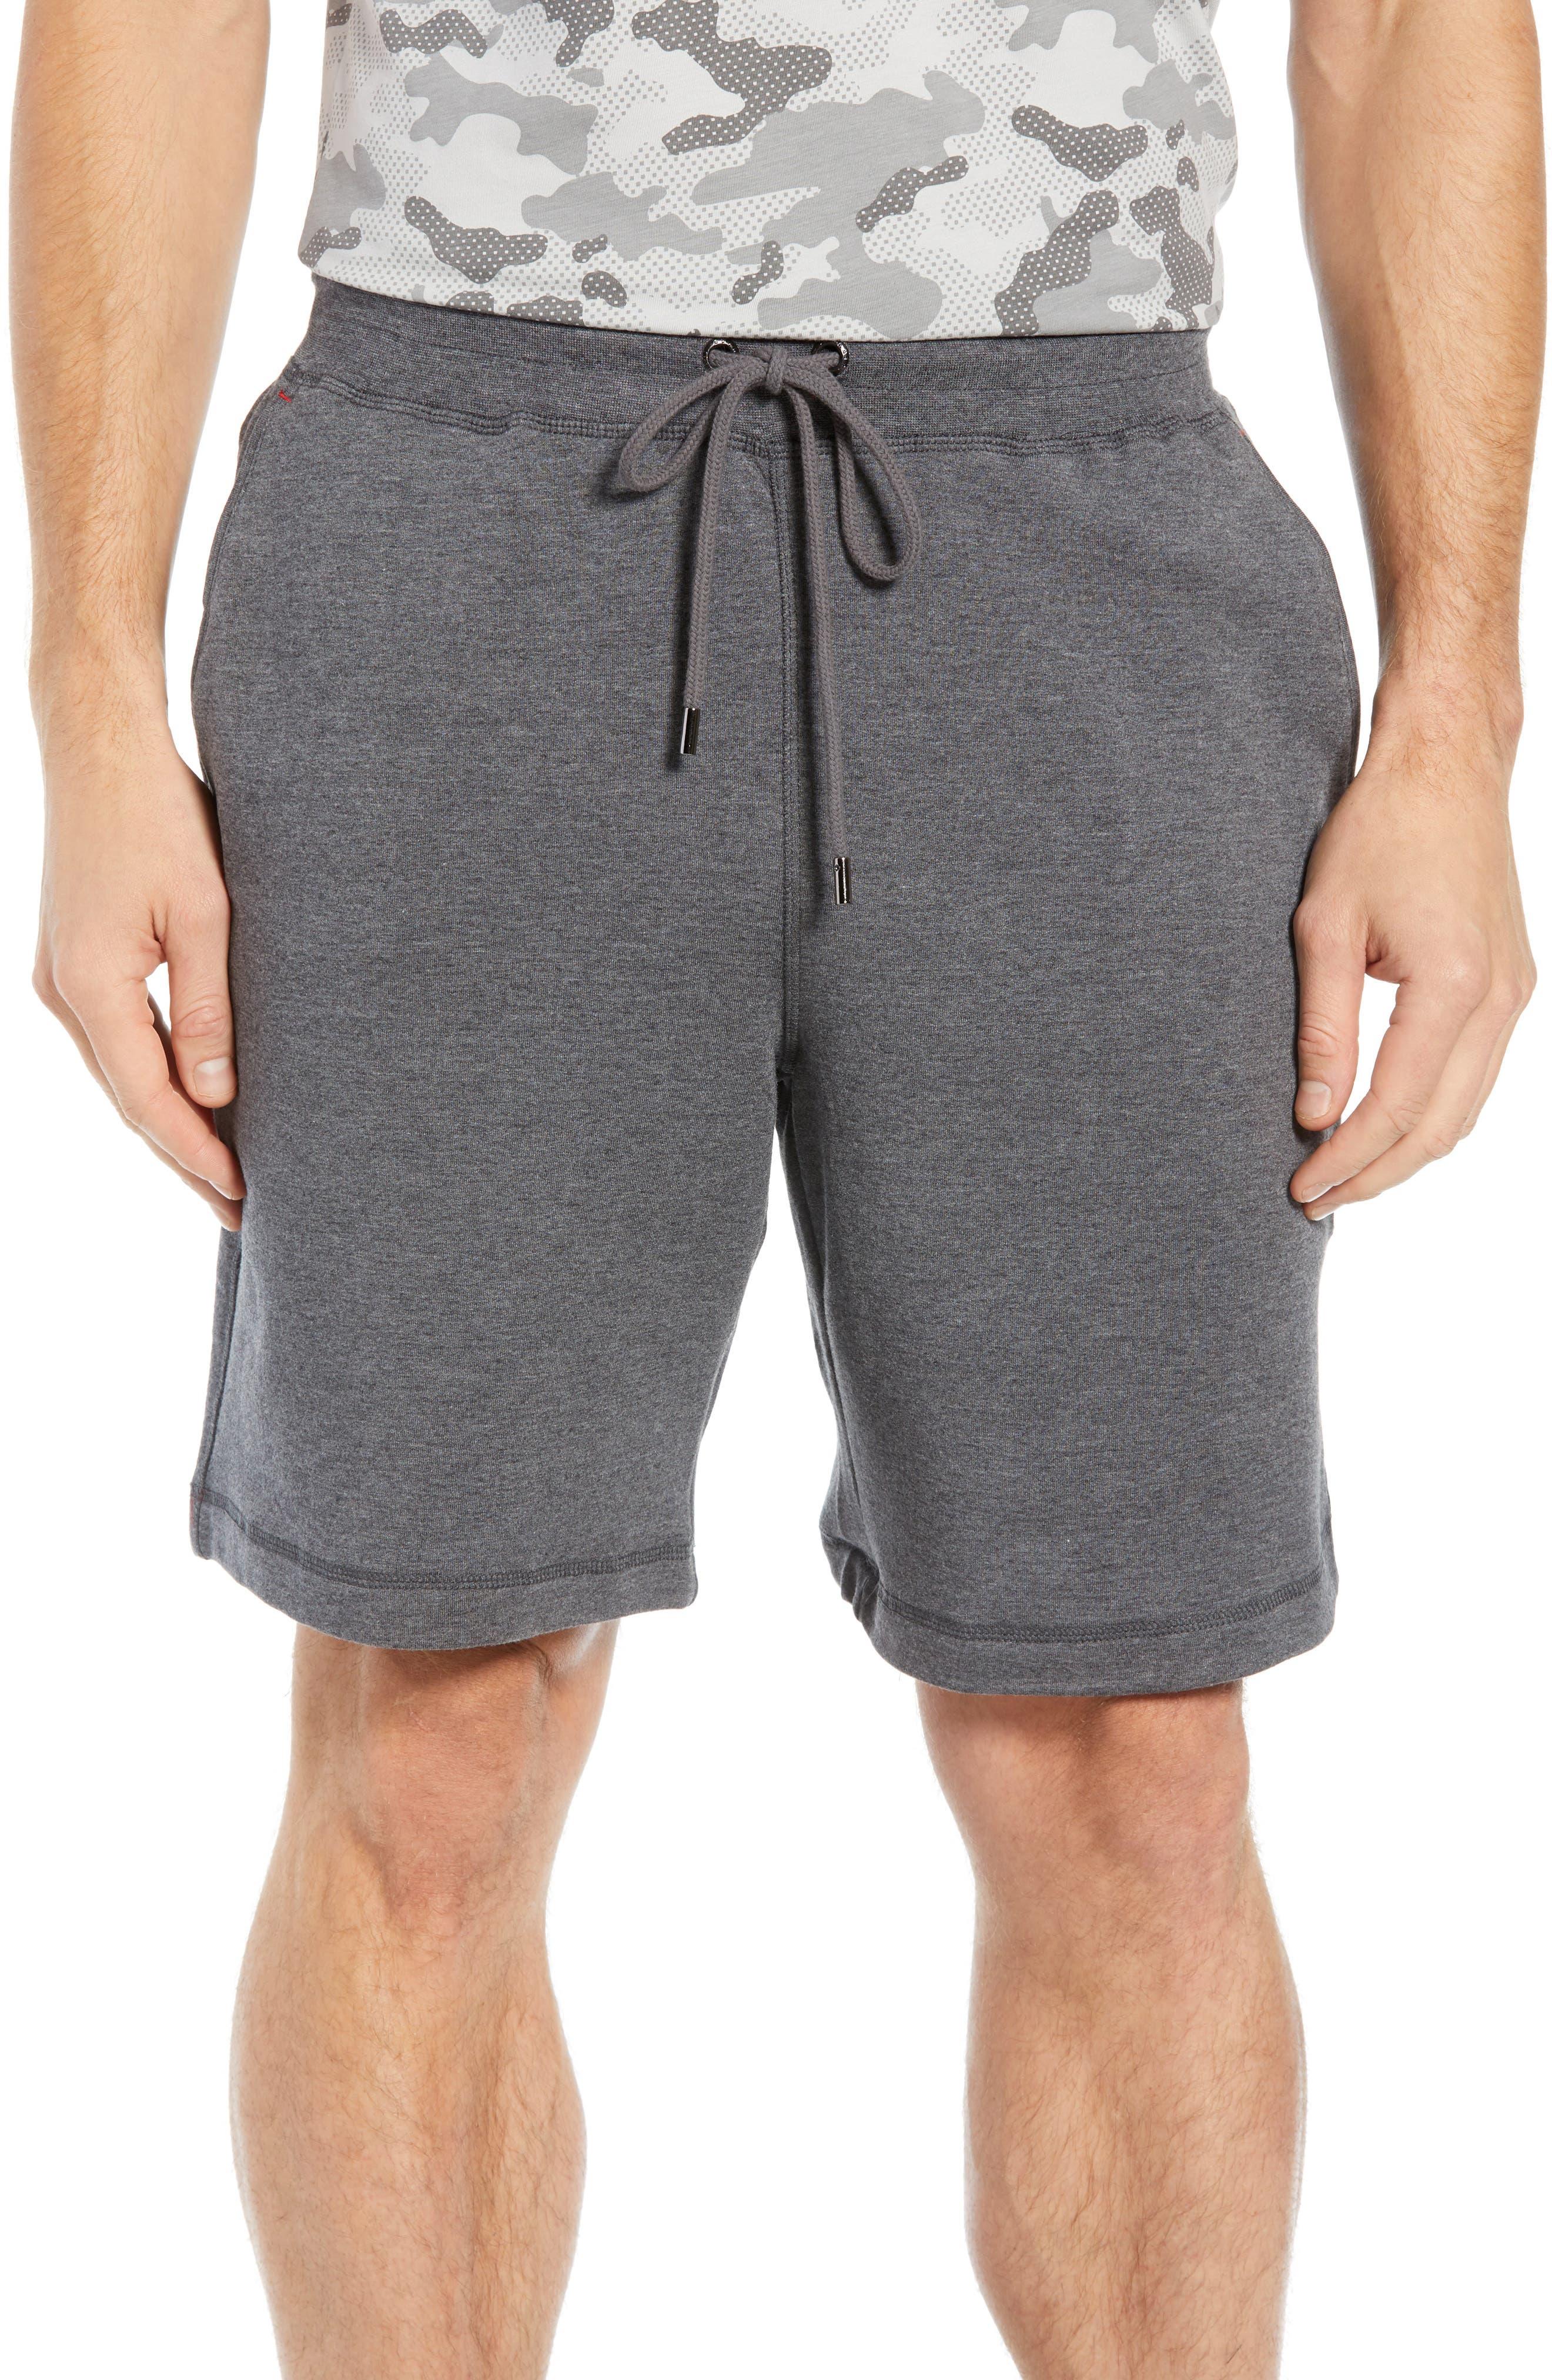 Modal Blend Lounge Shorts,                             Main thumbnail 1, color,                             CHARCOAL HEATHER